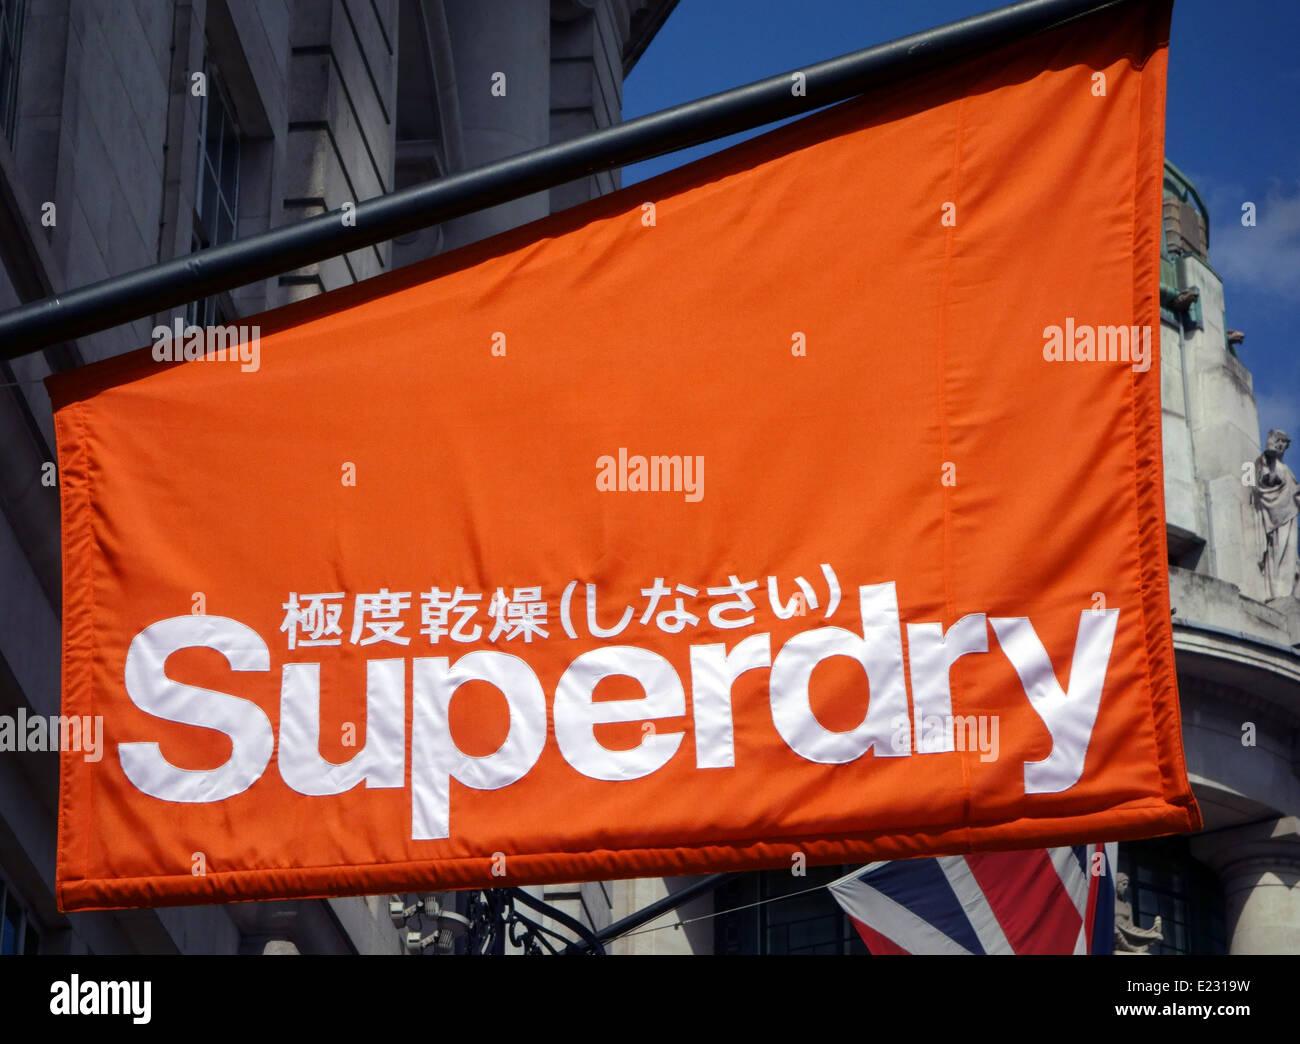 Superdry Store Shop Uk Stock Photos & Superdry Store Shop ...